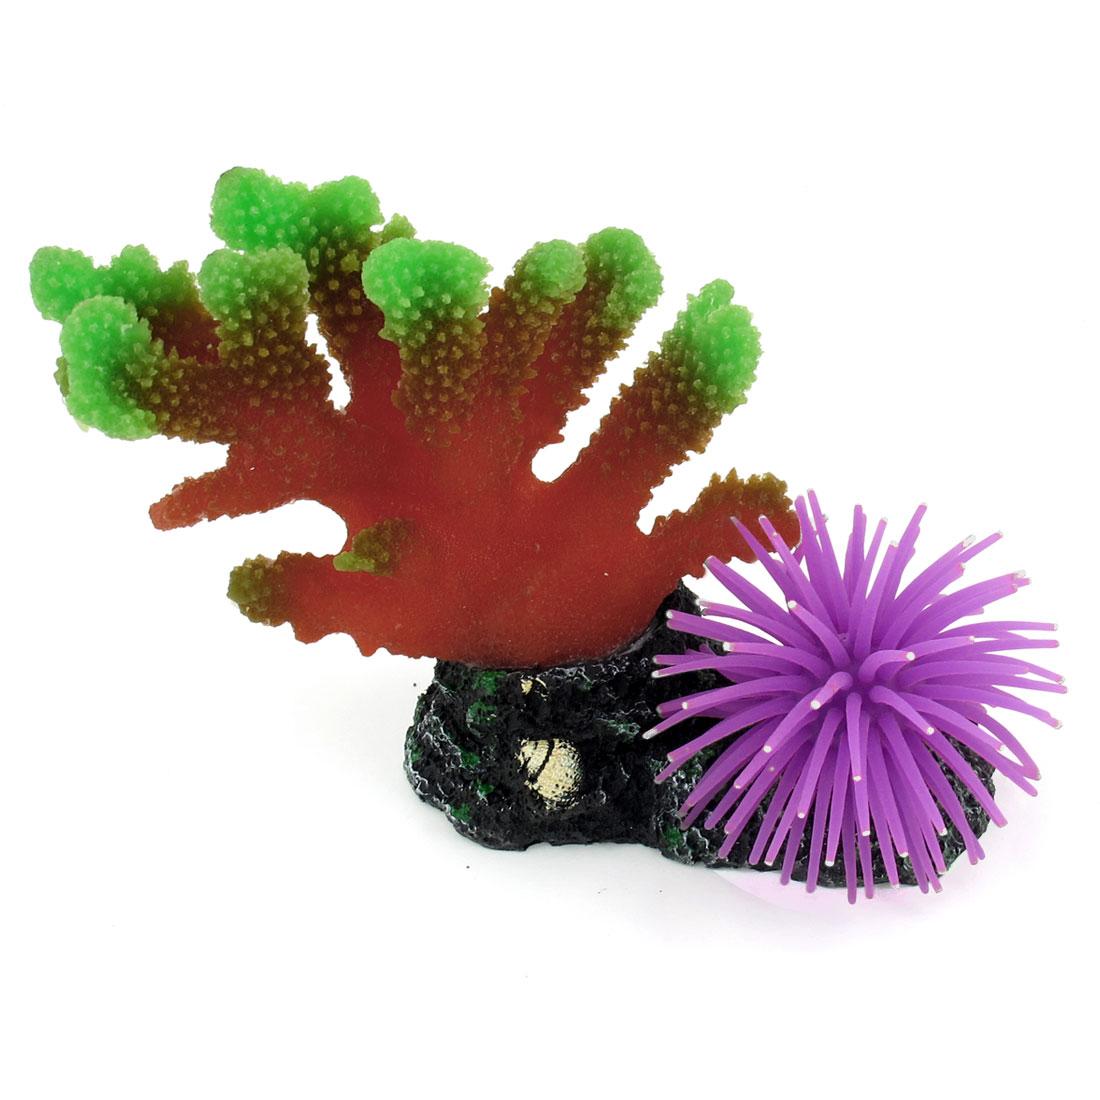 "5.9"" Height Simulation Aquarium Fish Tank Coral Anemone Decor Green Purple"